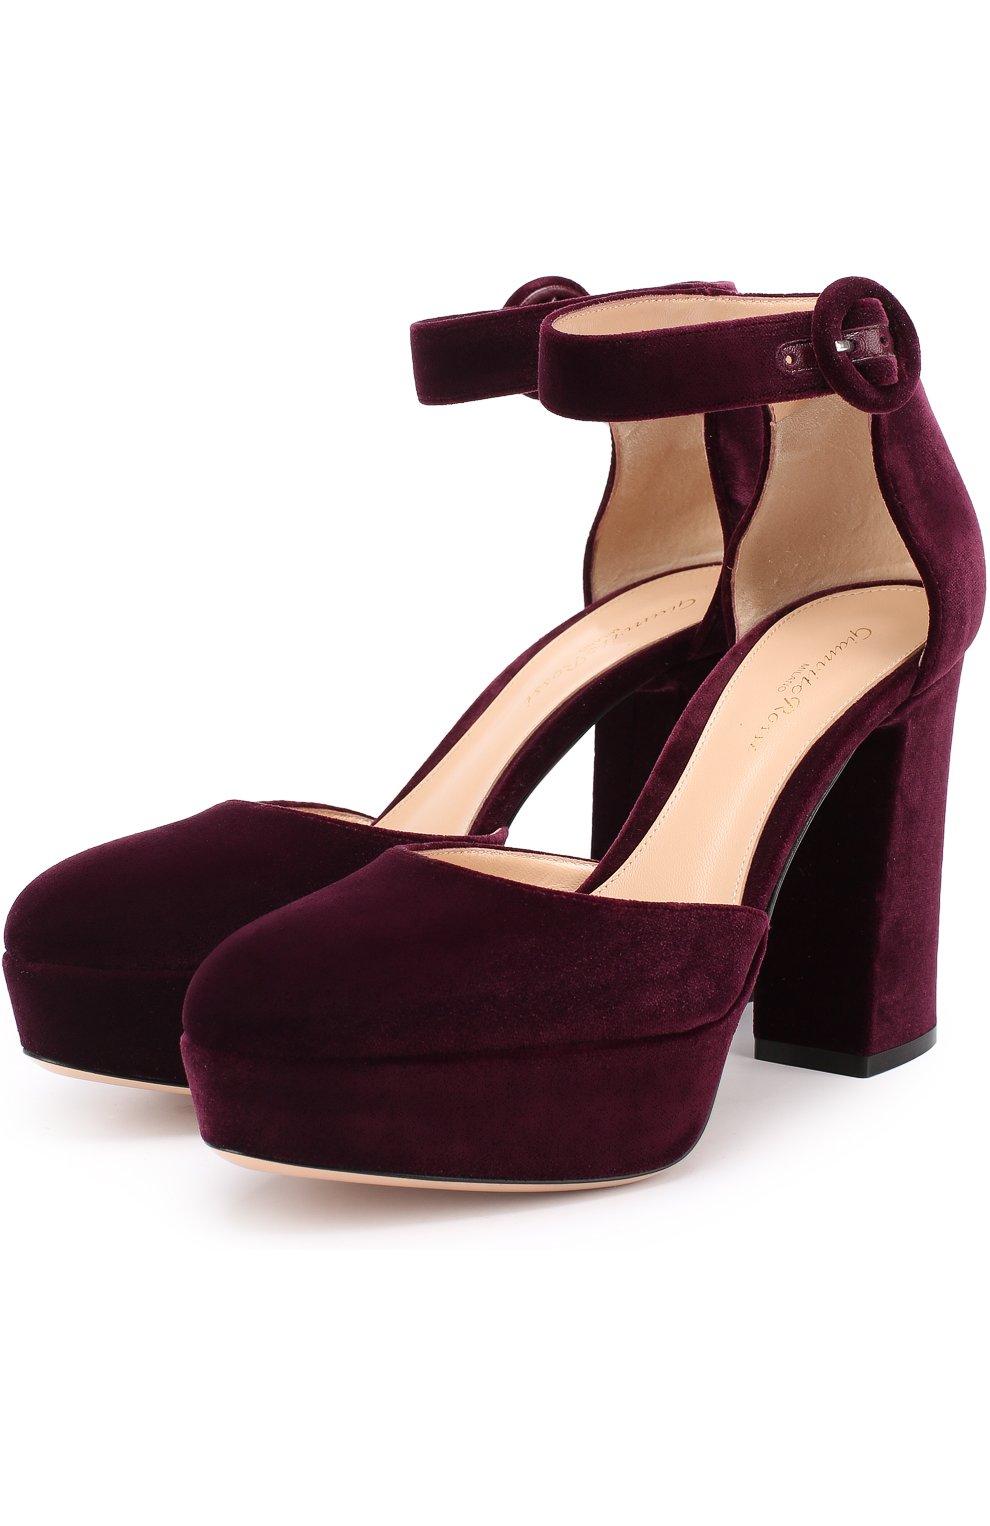 8d458f7ee Бархатные туфли на устойчивом каблуке и платформе Gianvito Rossi  темно-фиолетовые   Фото №1